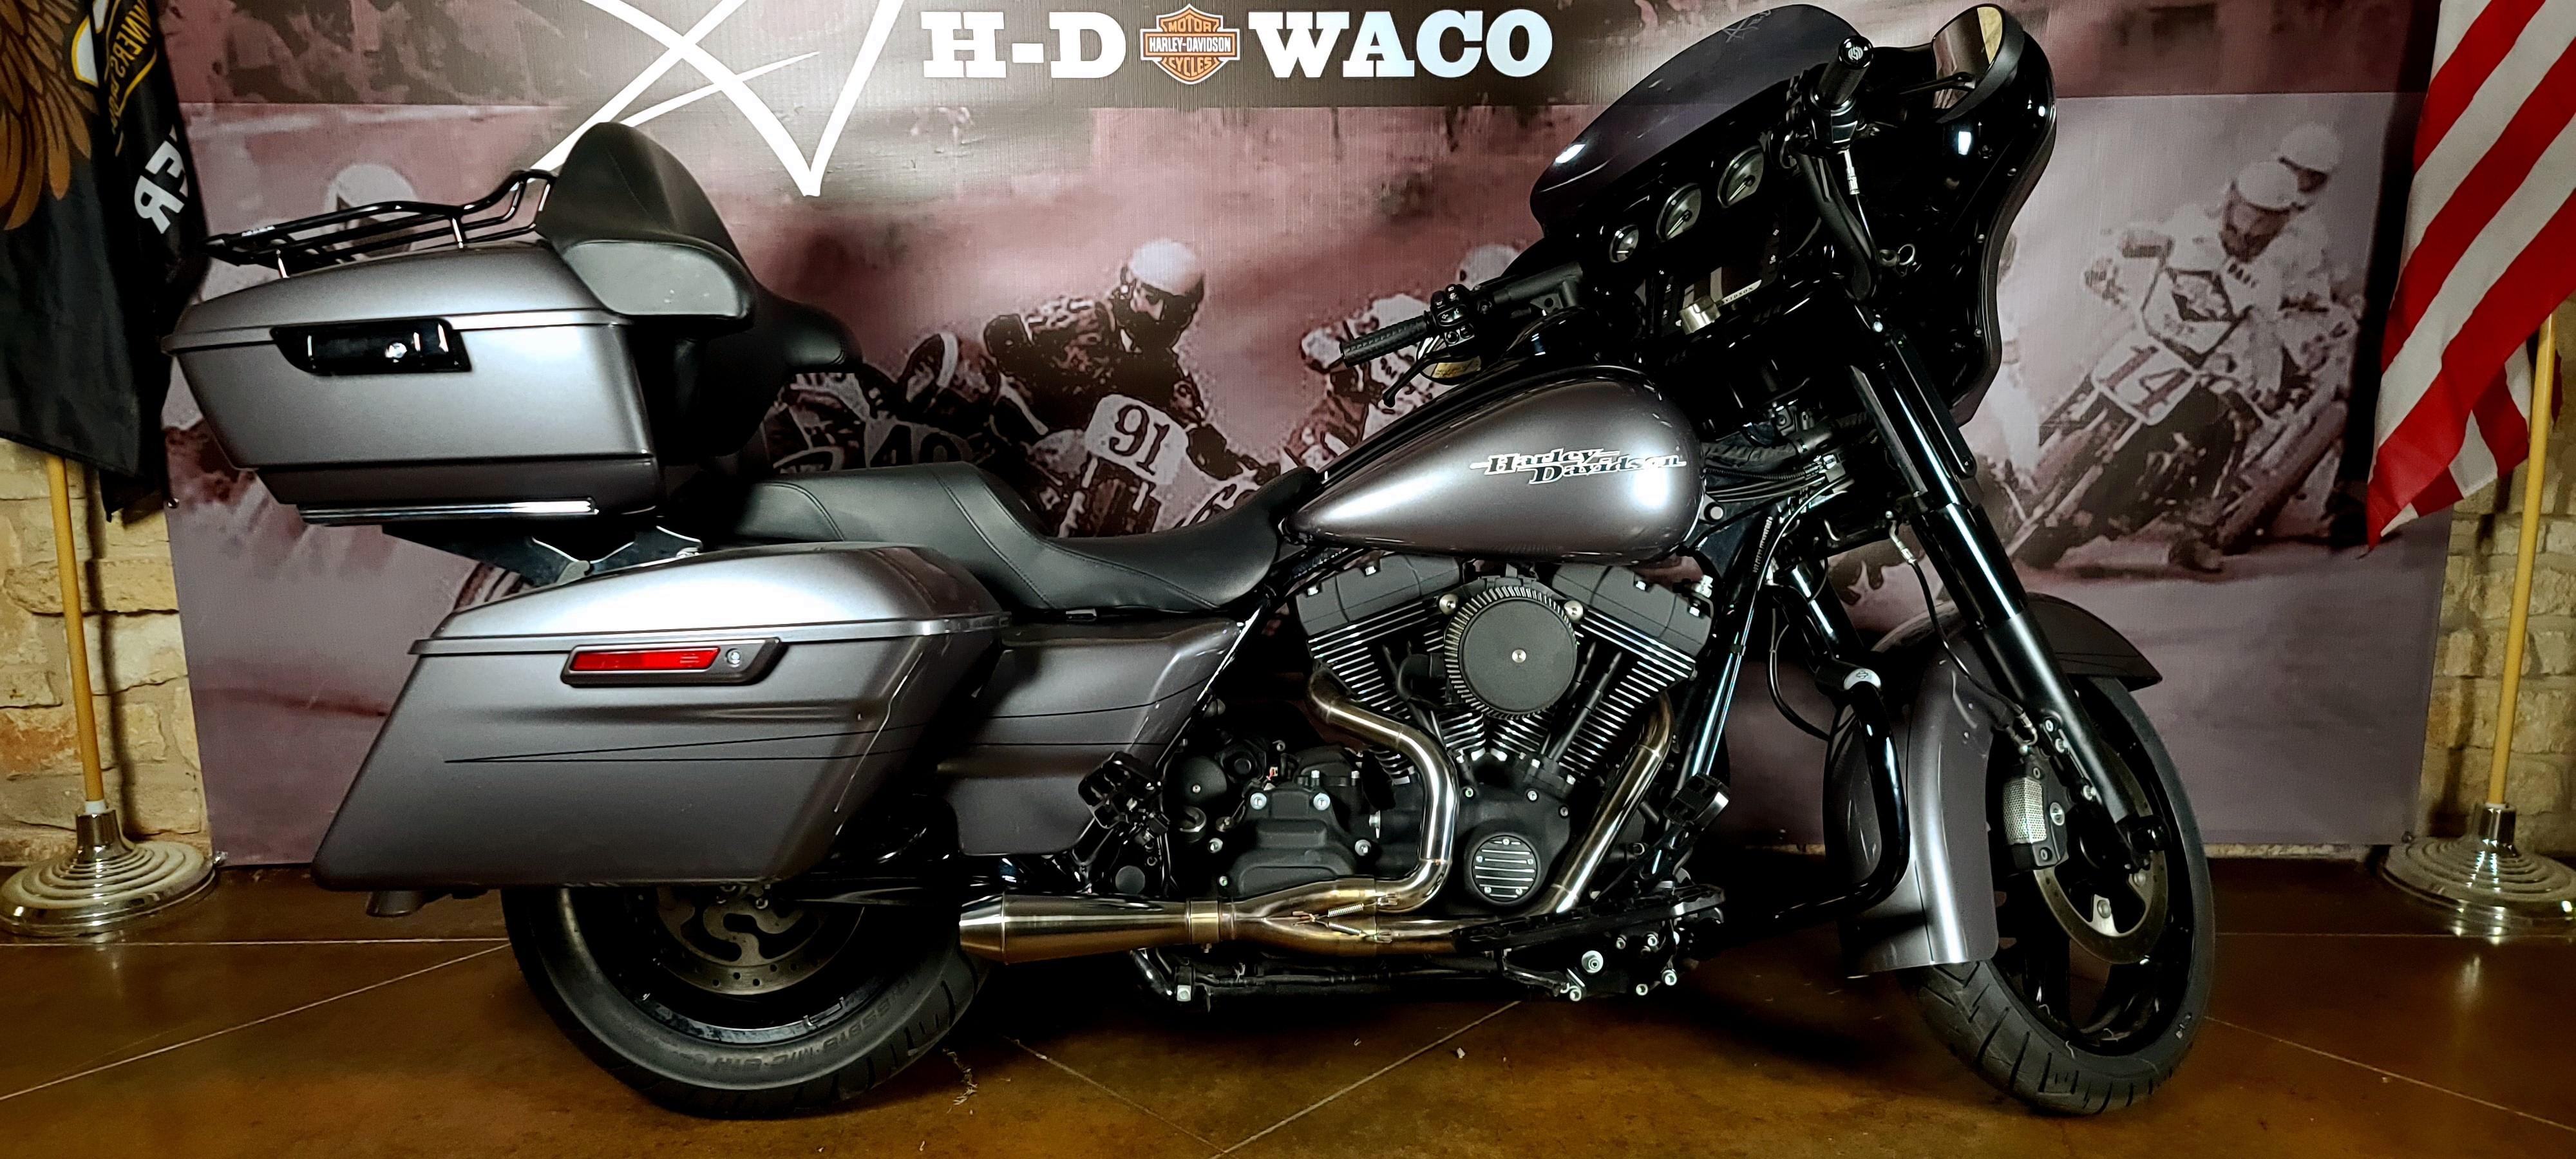 2015 Harley-Davidson Street Glide Special at Harley-Davidson of Waco